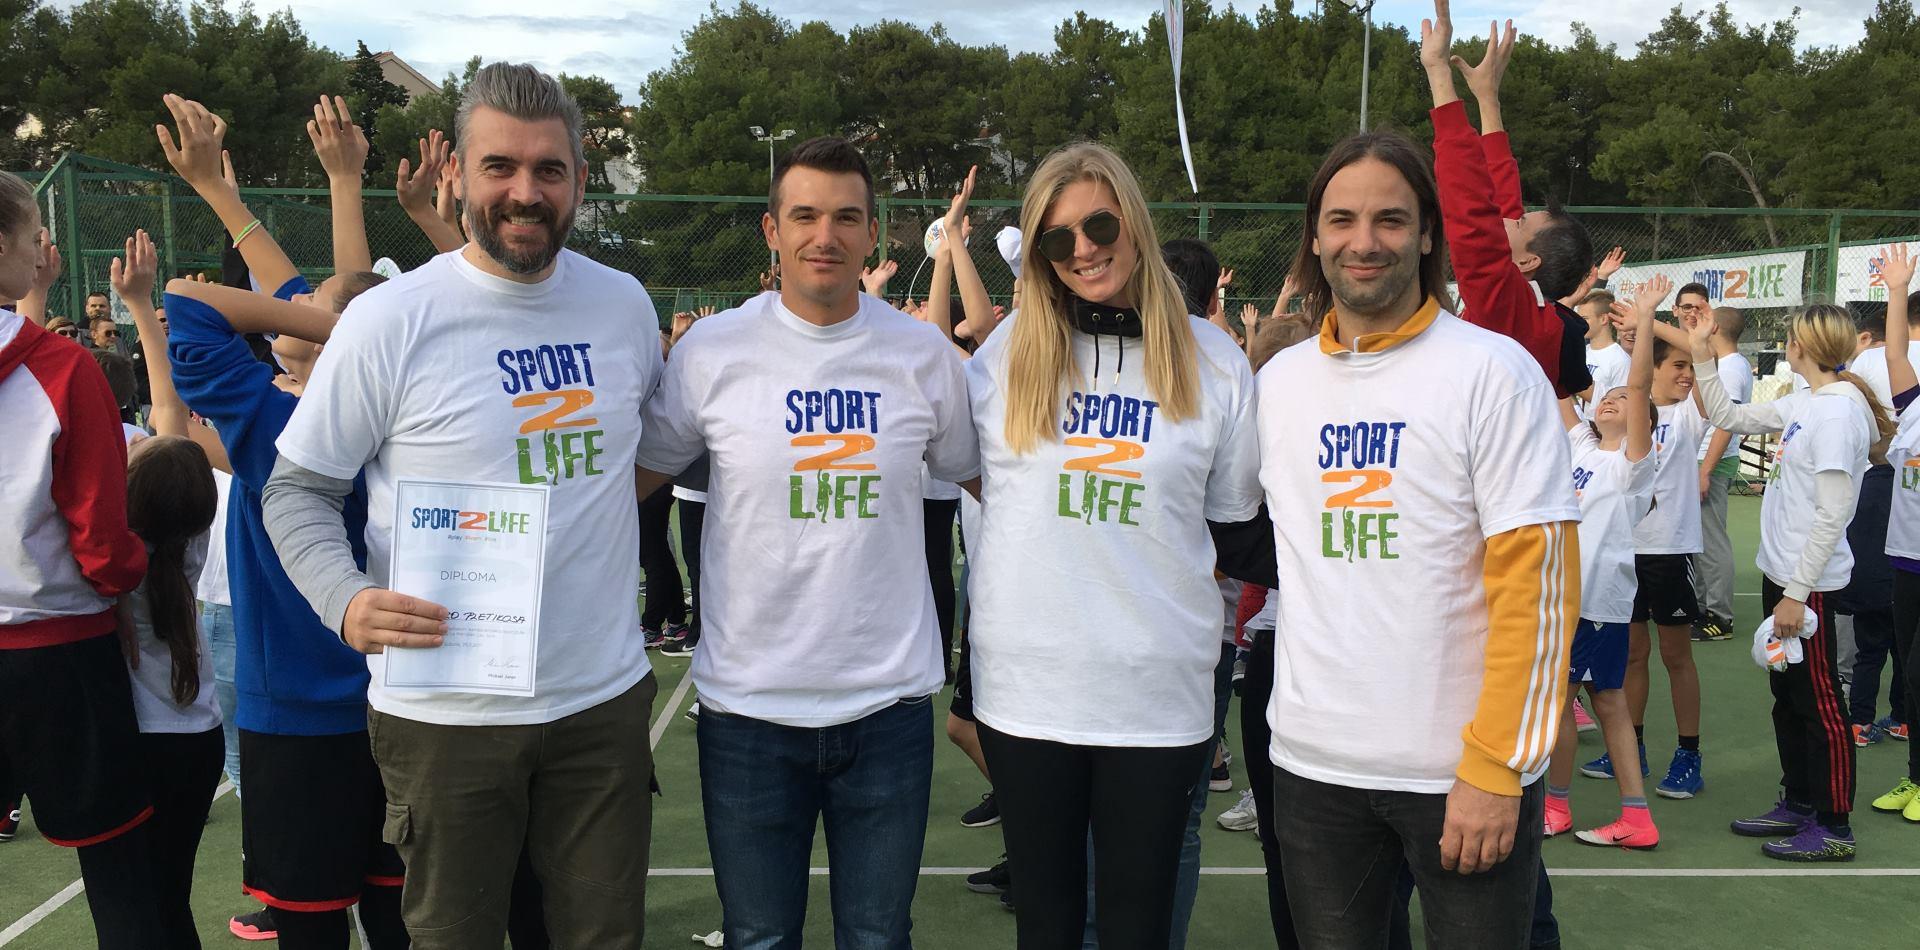 SPORT2LIFE Poznati hrvatski sportaši u Splitu predstavili zabavan edukativno–sportski projekt